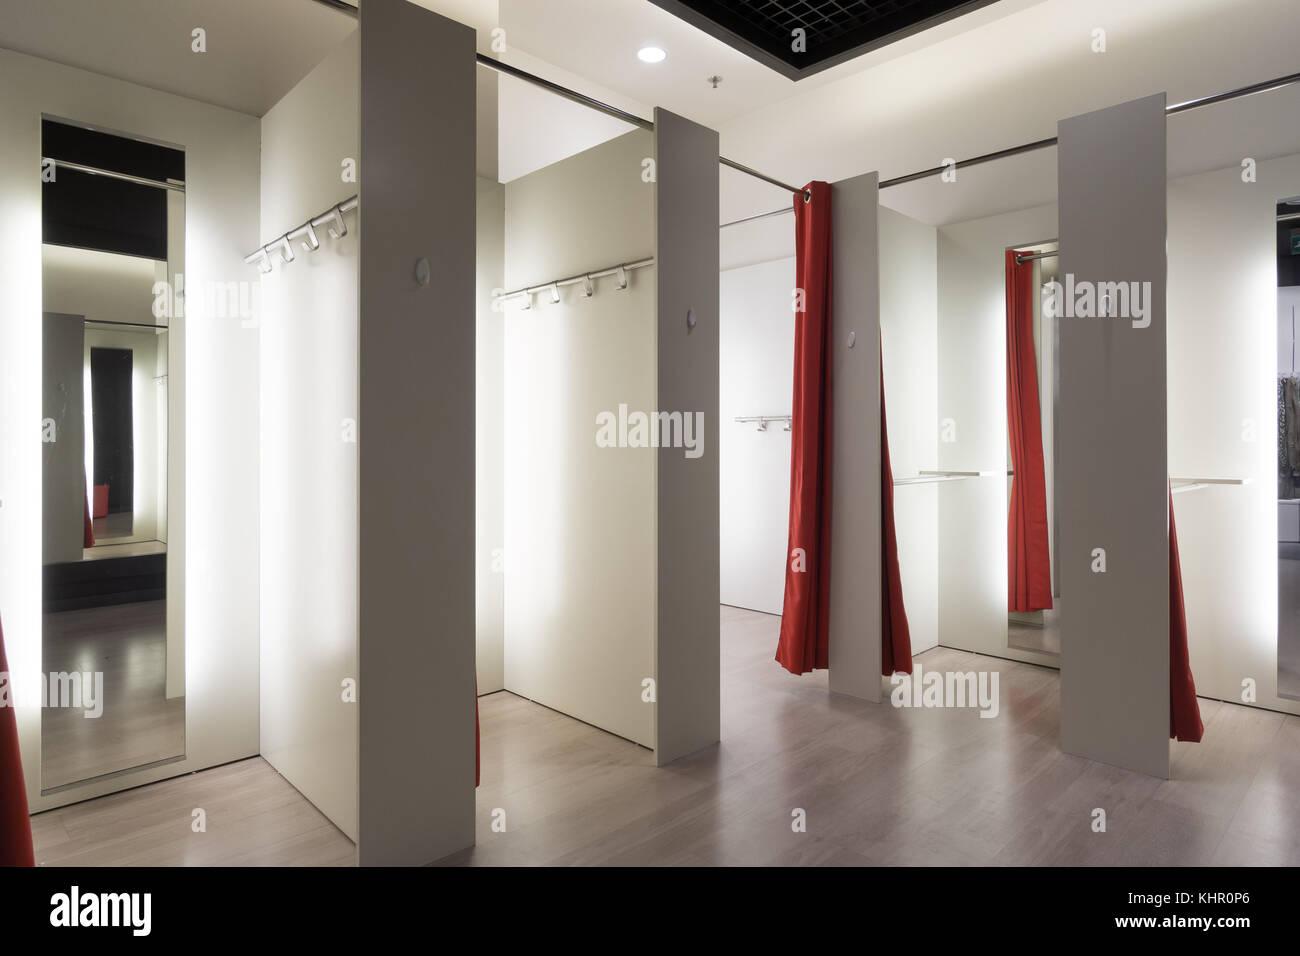 Fitting room interior - Stock Image